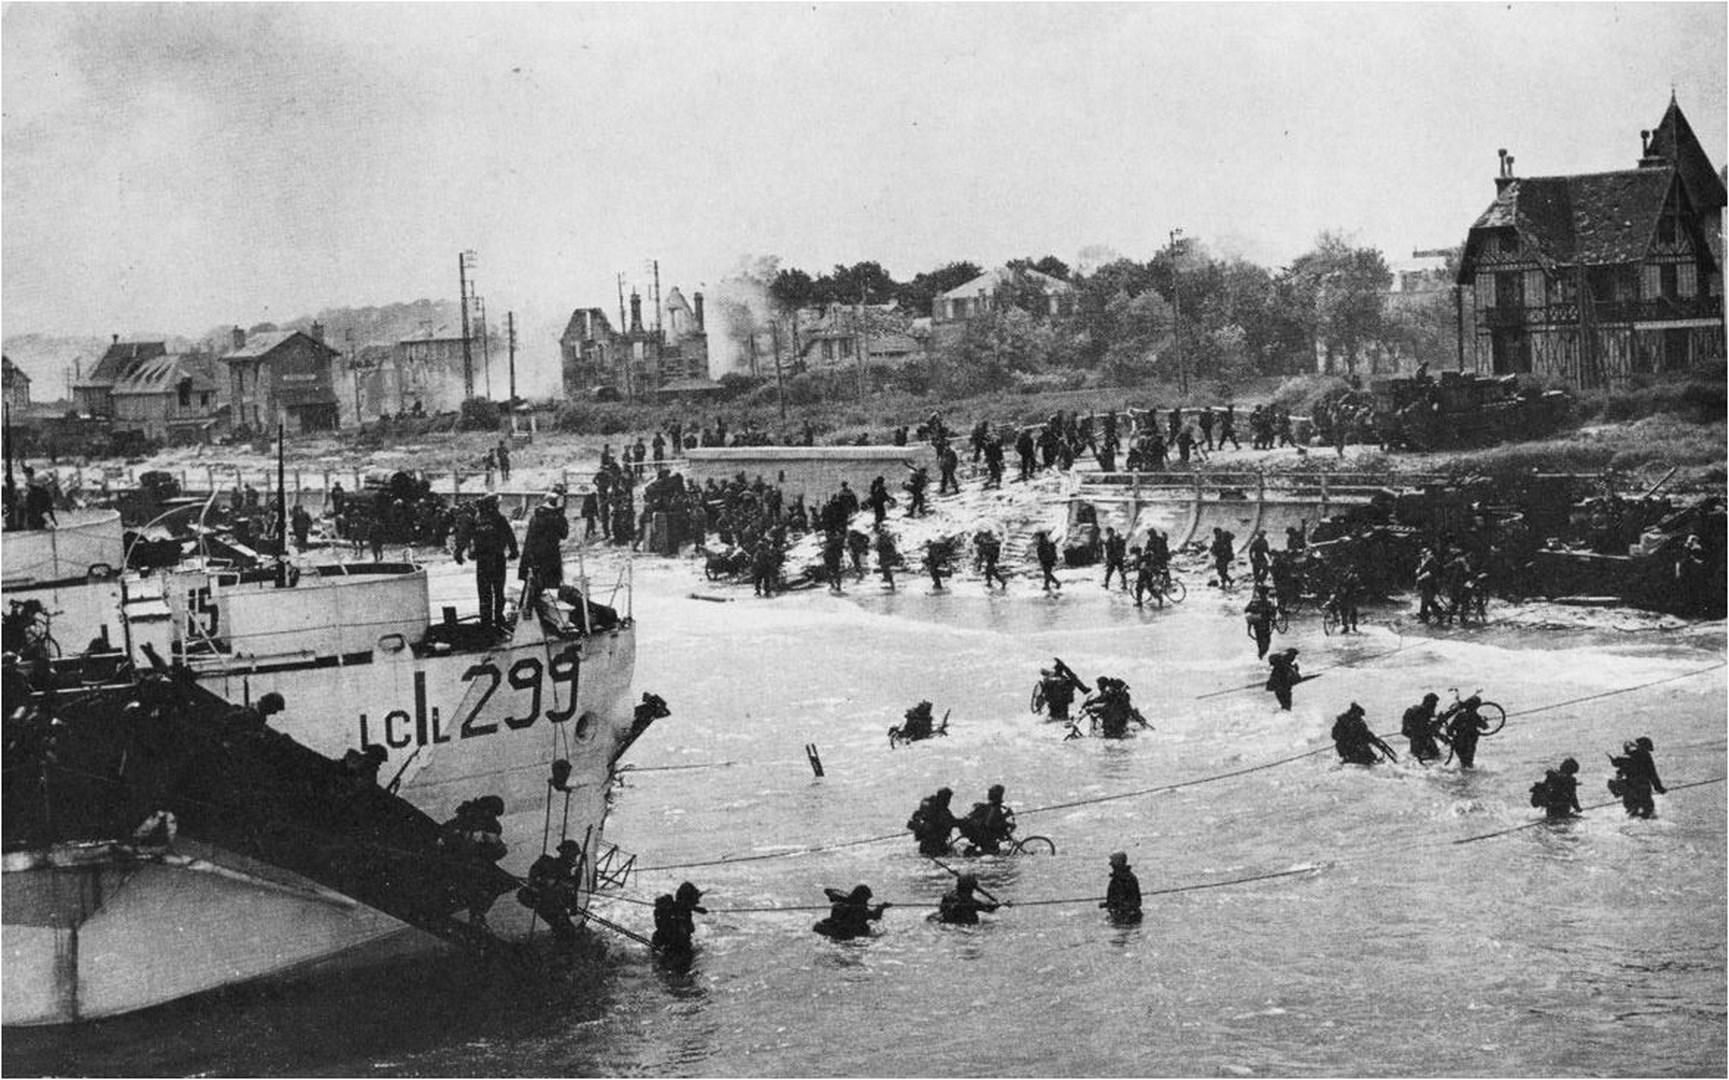 Juno Beach 1944 | American D-Day Tours | Normandy Beaches Battlefield Guide